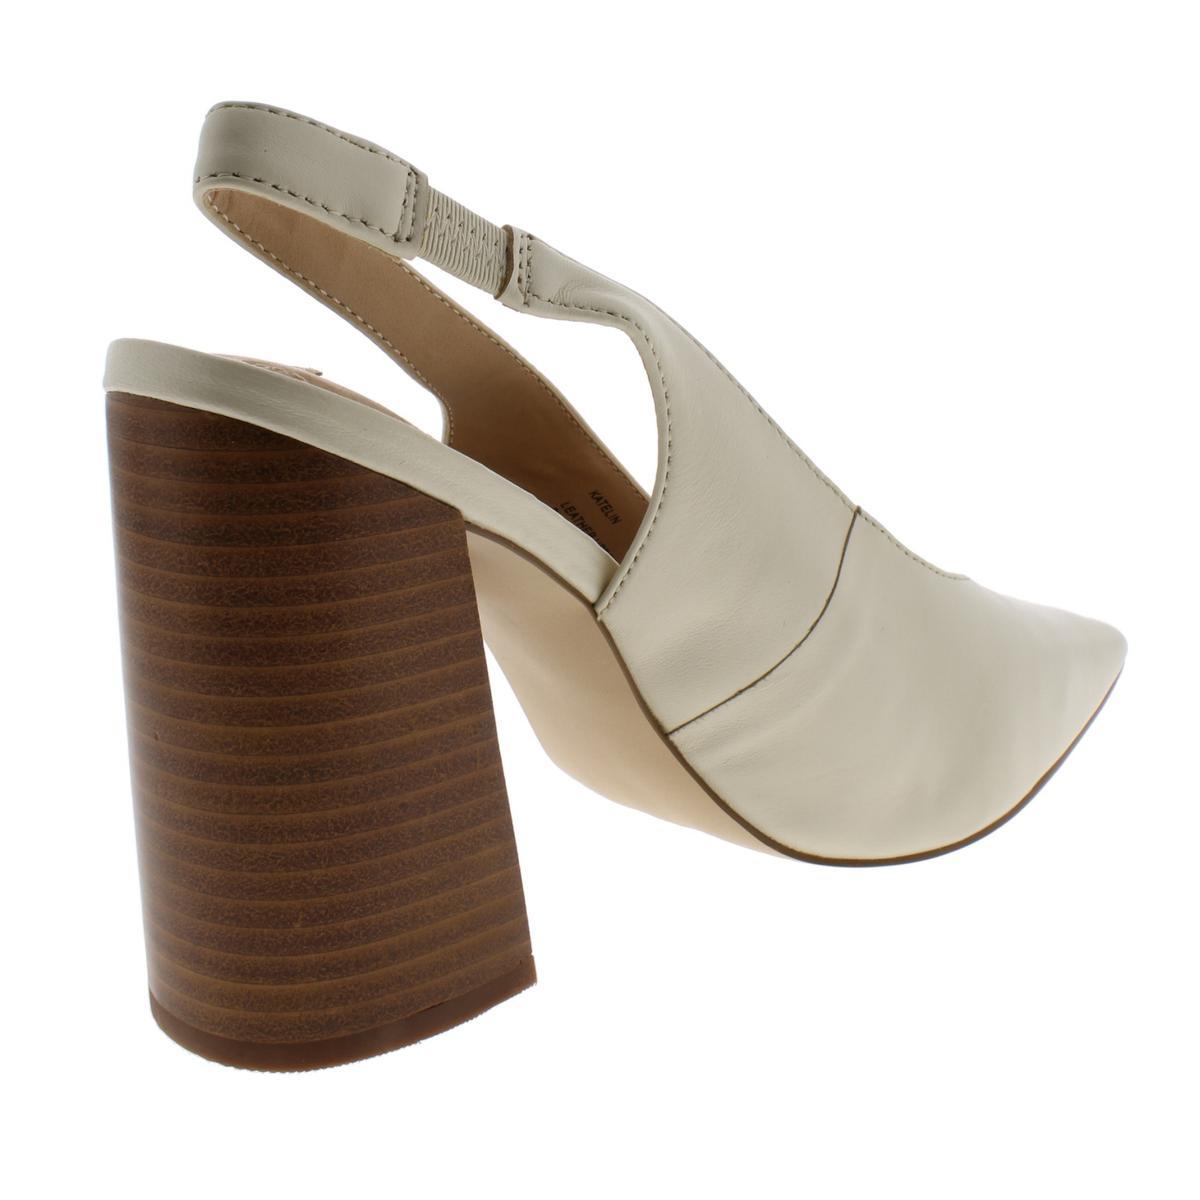 Steve-Madden-Womens-Katelin-Leather-Pointed-Toe-Slingback-Heels-Shoes-BHFO-3798 thumbnail 8